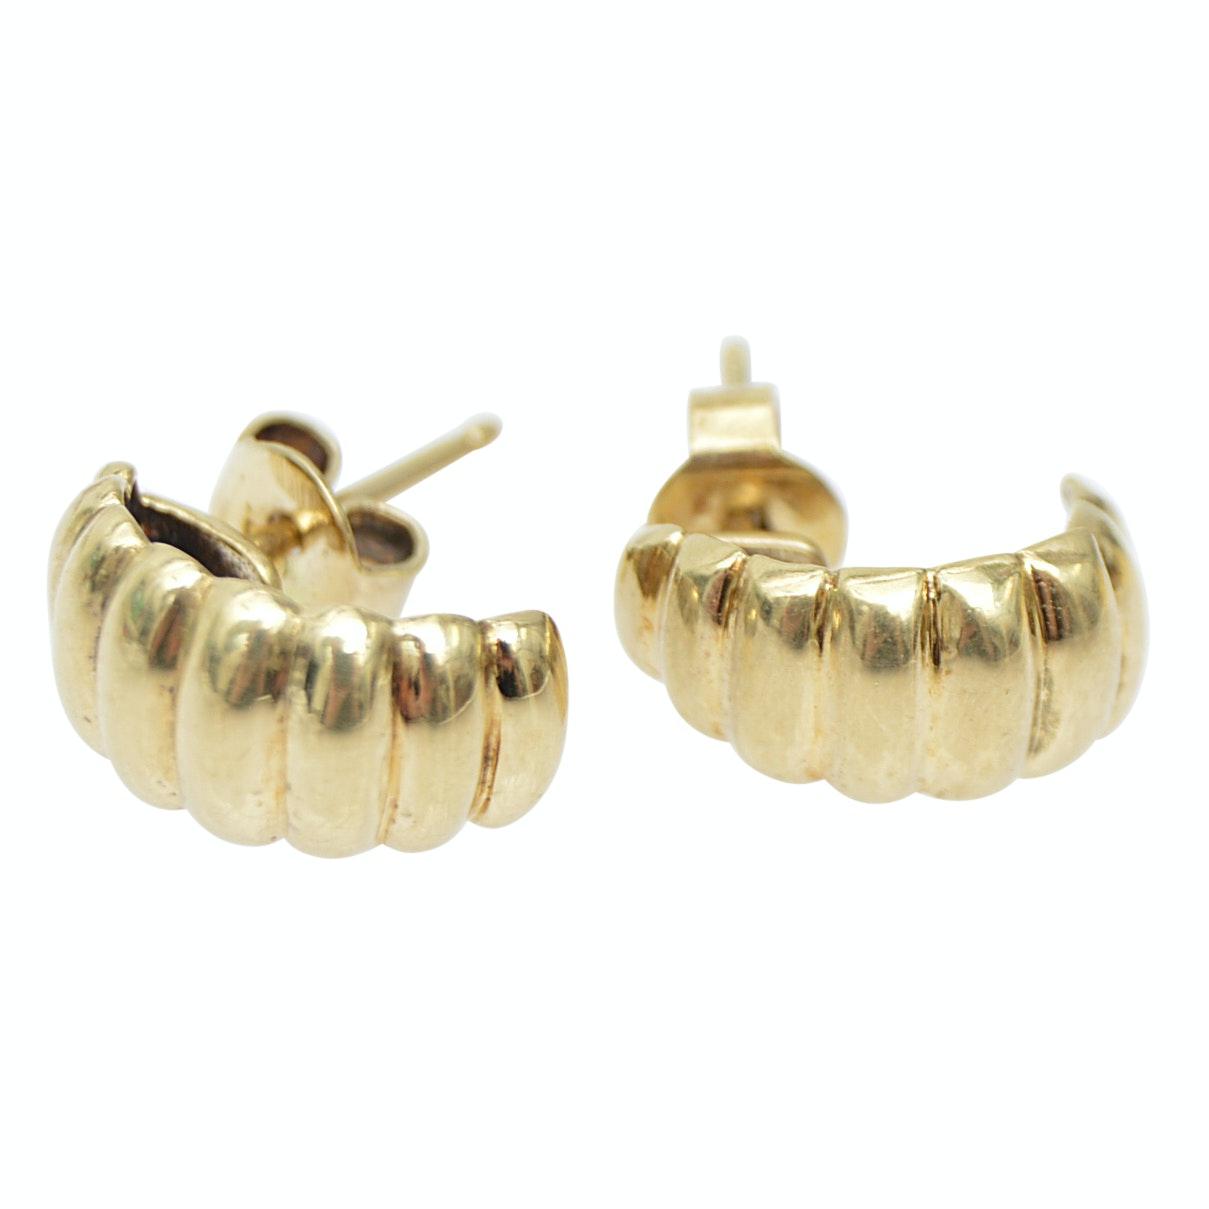 14K Yellow Gold Ribbed Pierced Earrings